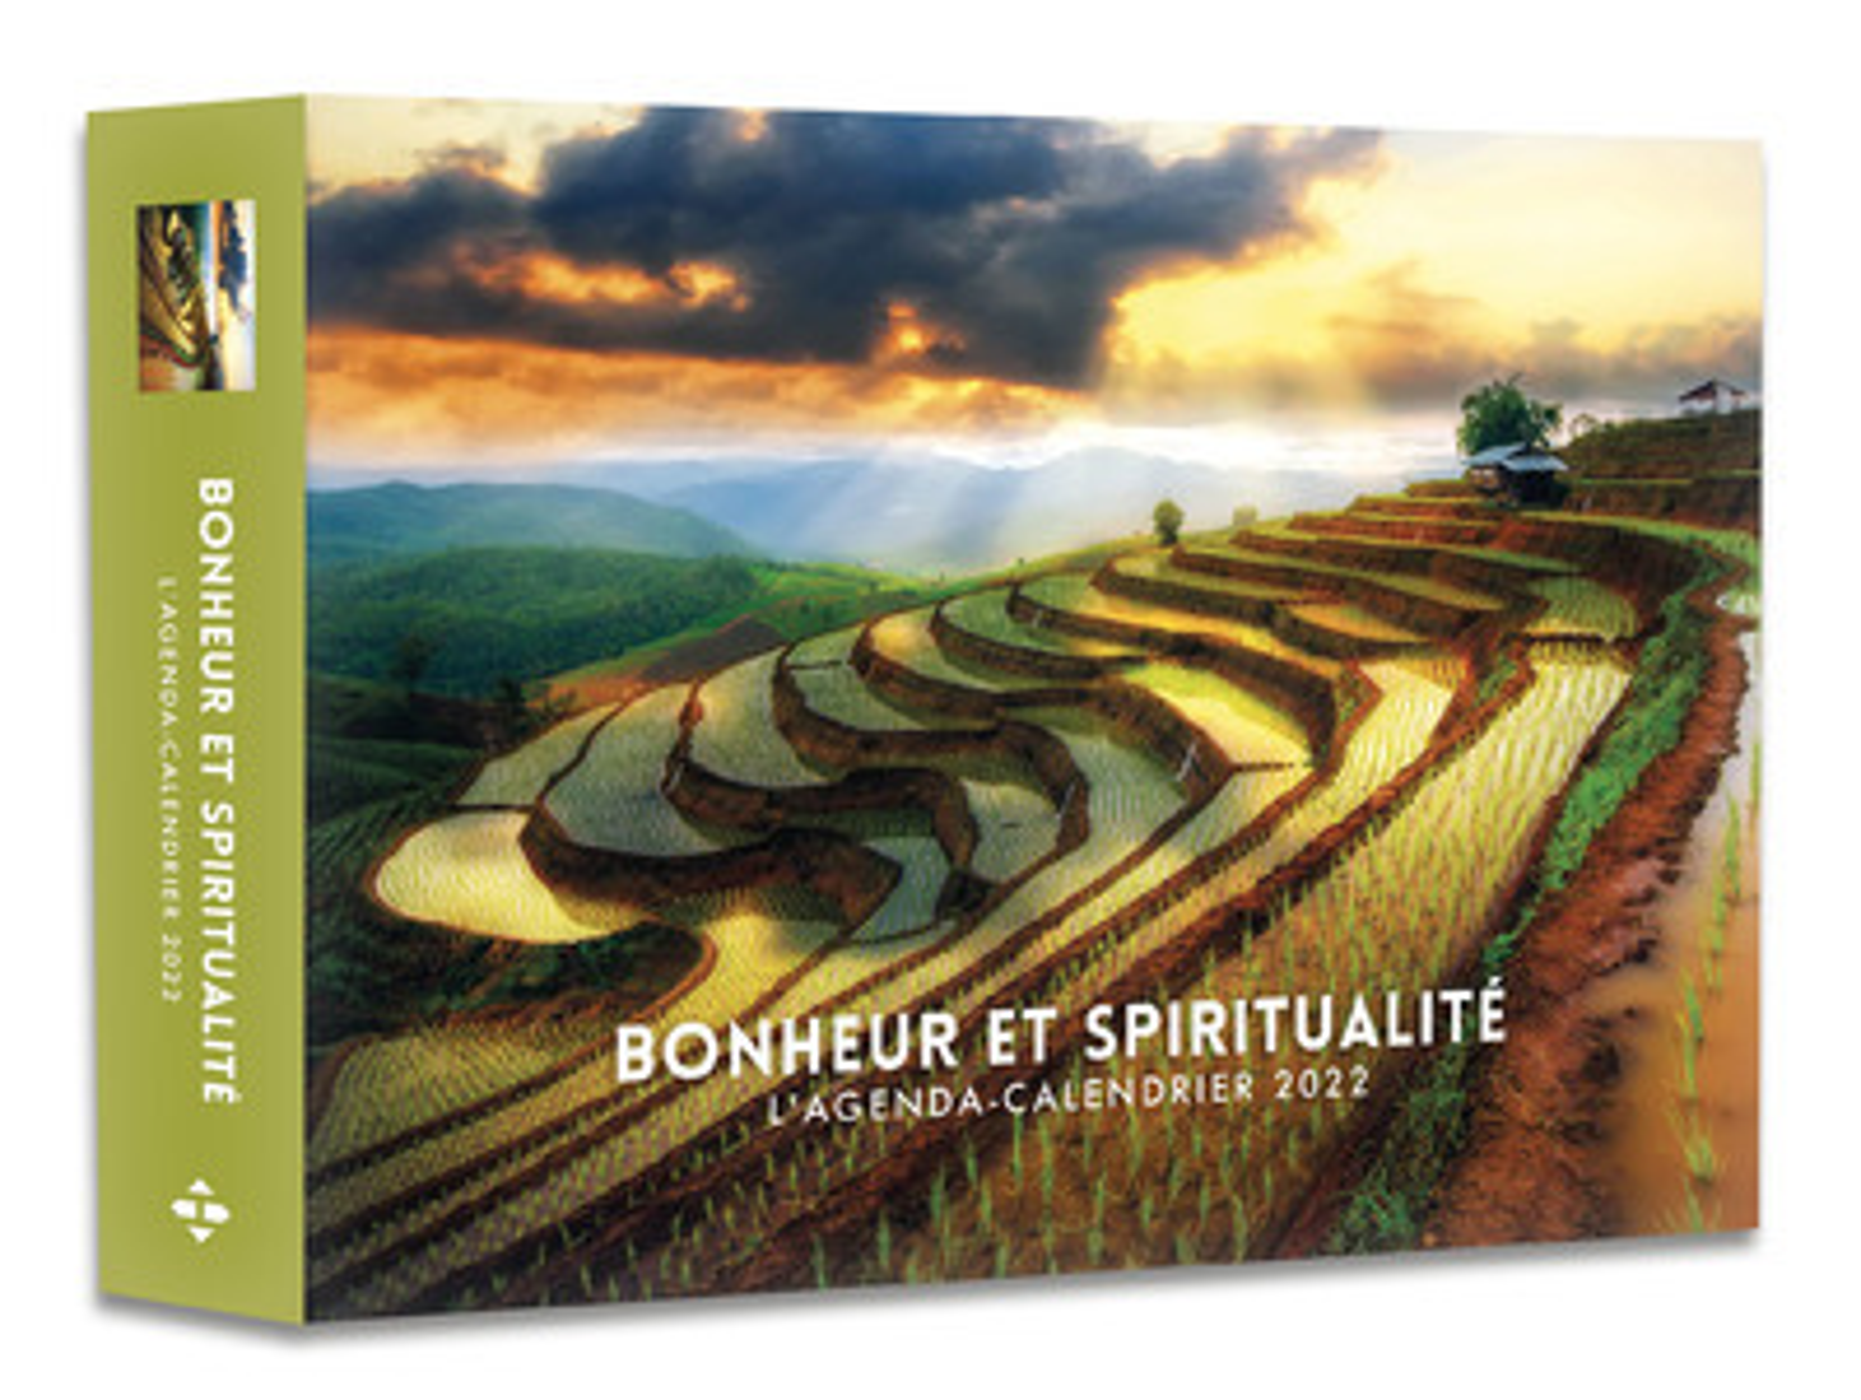 L'AGENDA - CALENDRIER BONHEUR ET SPIRITUALITE 2022